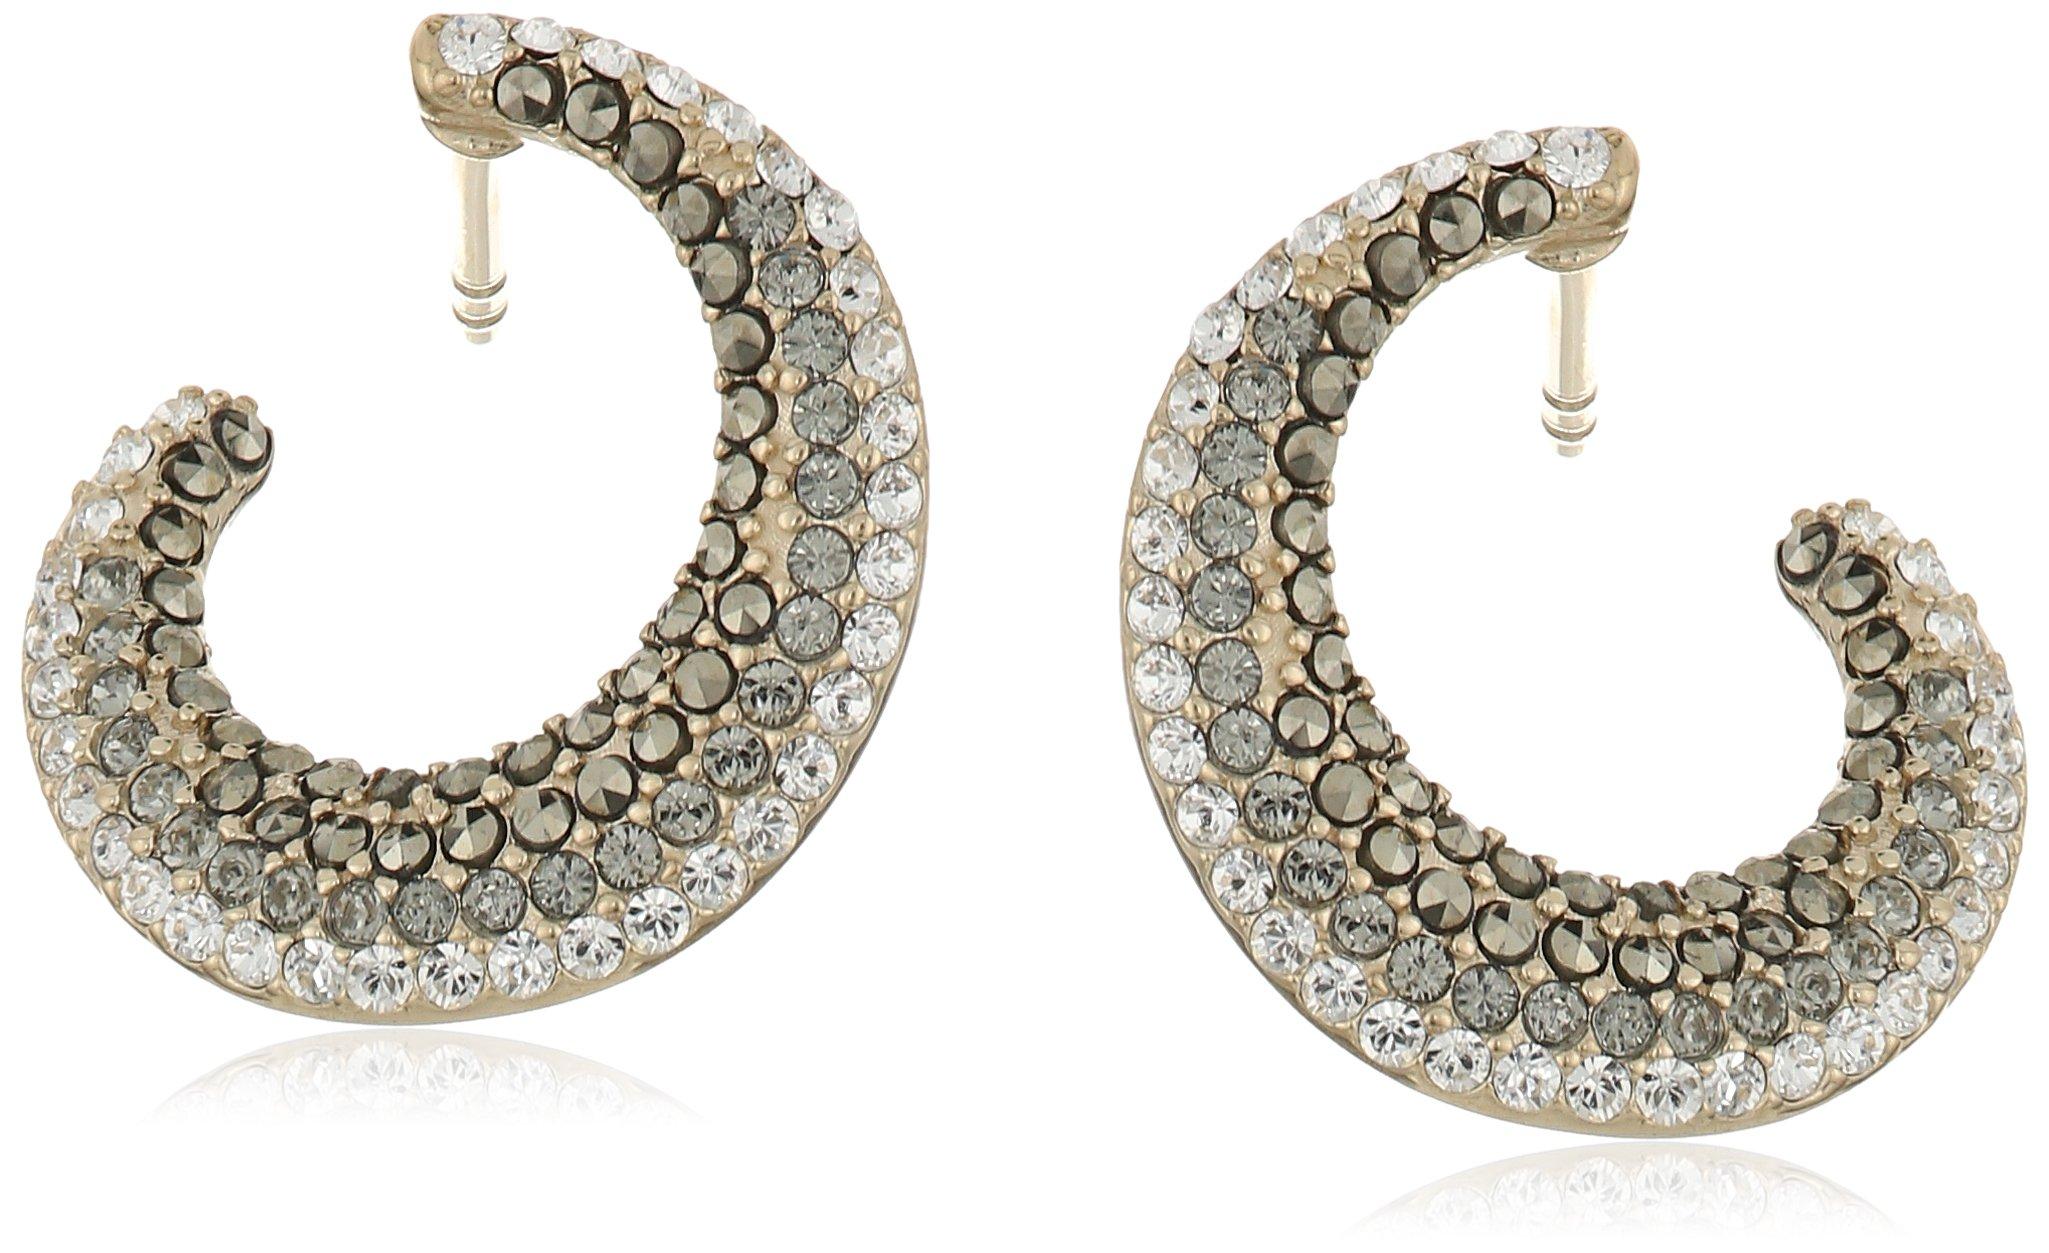 Judity Jack ''Earristable Wonders'' Sterling Silver/Swarovski Black Diamond Marccasite Gold-Tone Hoop Earrings